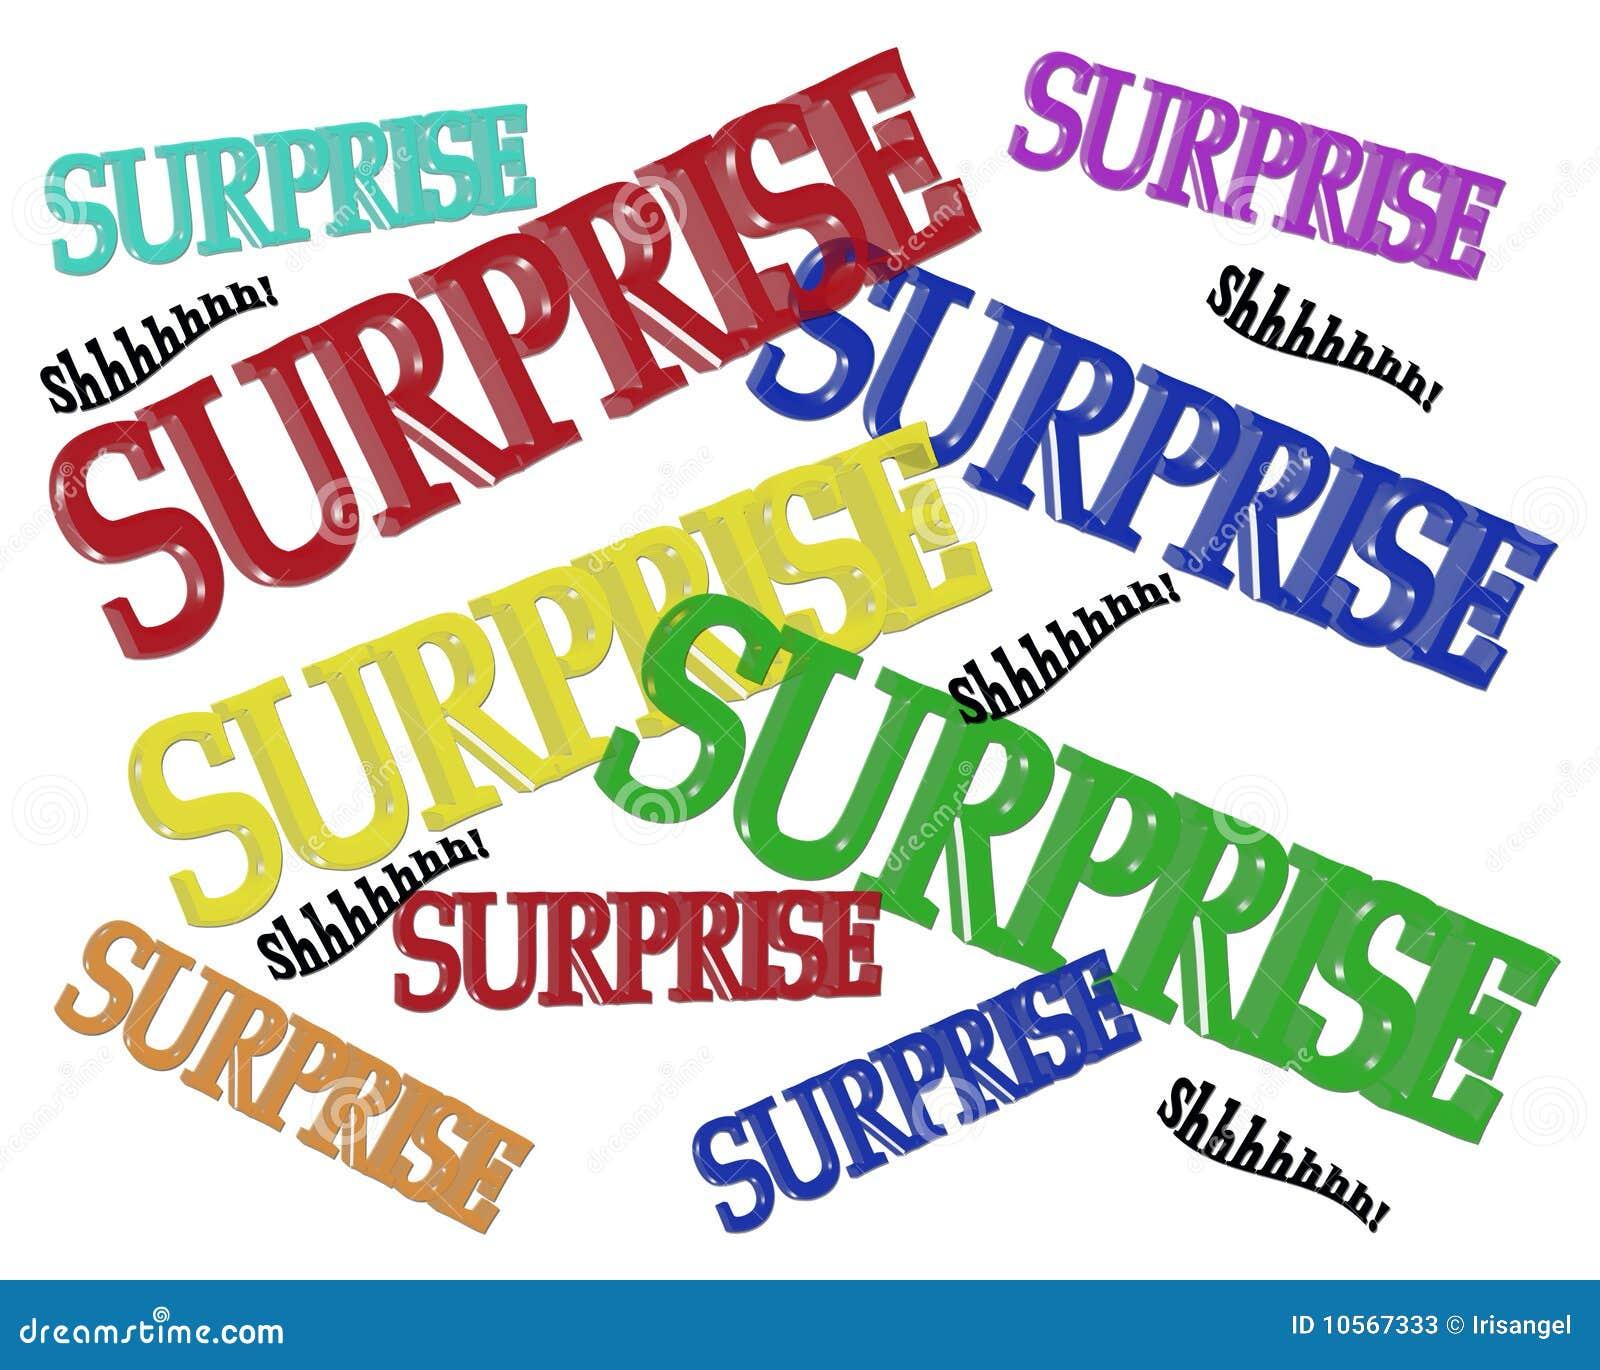 Surprise Birthday Party Clip Art